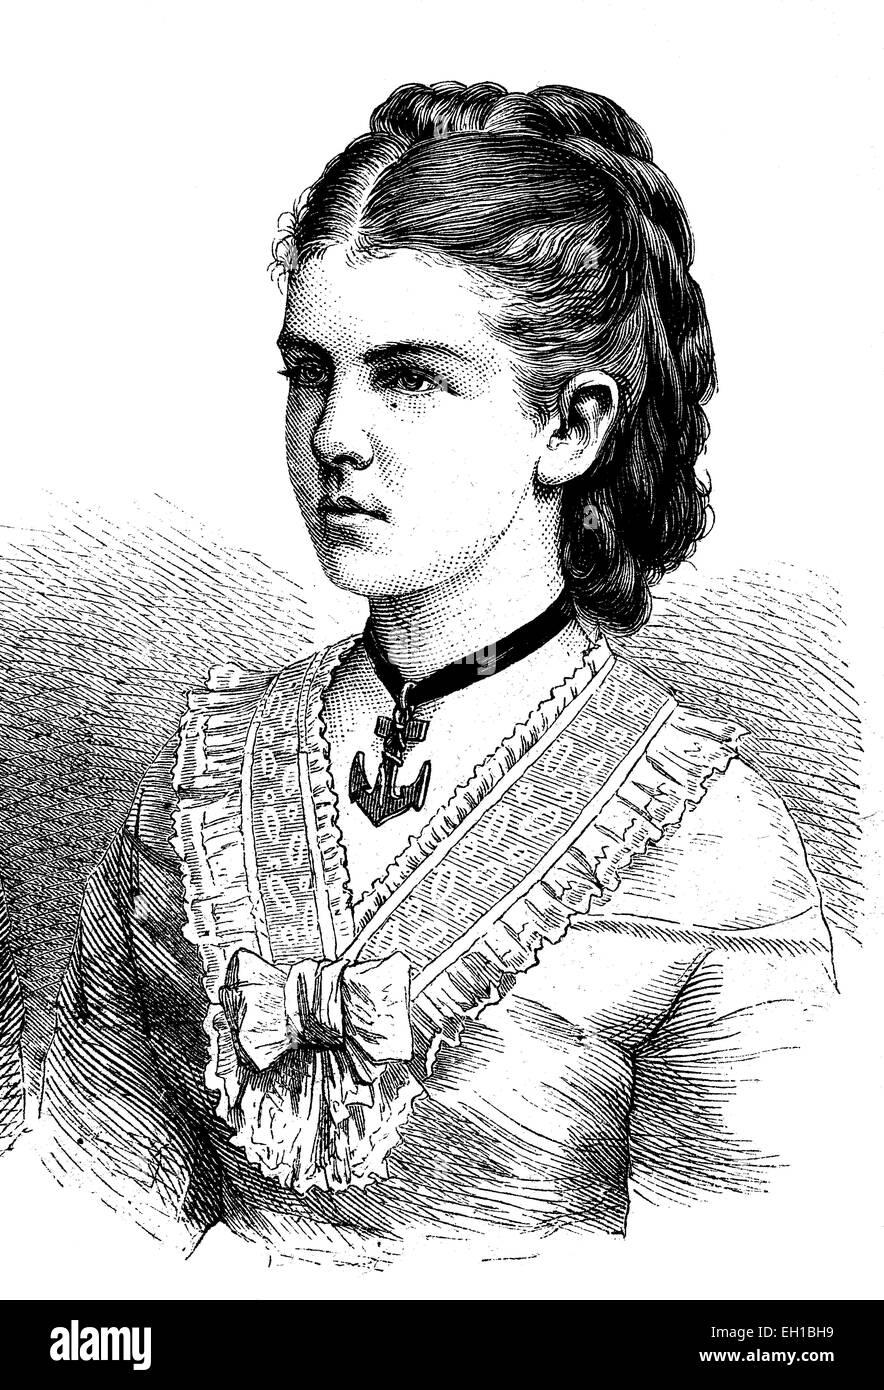 Princess Elizabeth Anna of Prussia, 1857 - 1895, wife of Grand Duke Friedrich August of Oldenburg, historical illustrati on, 1877 Stock Photo